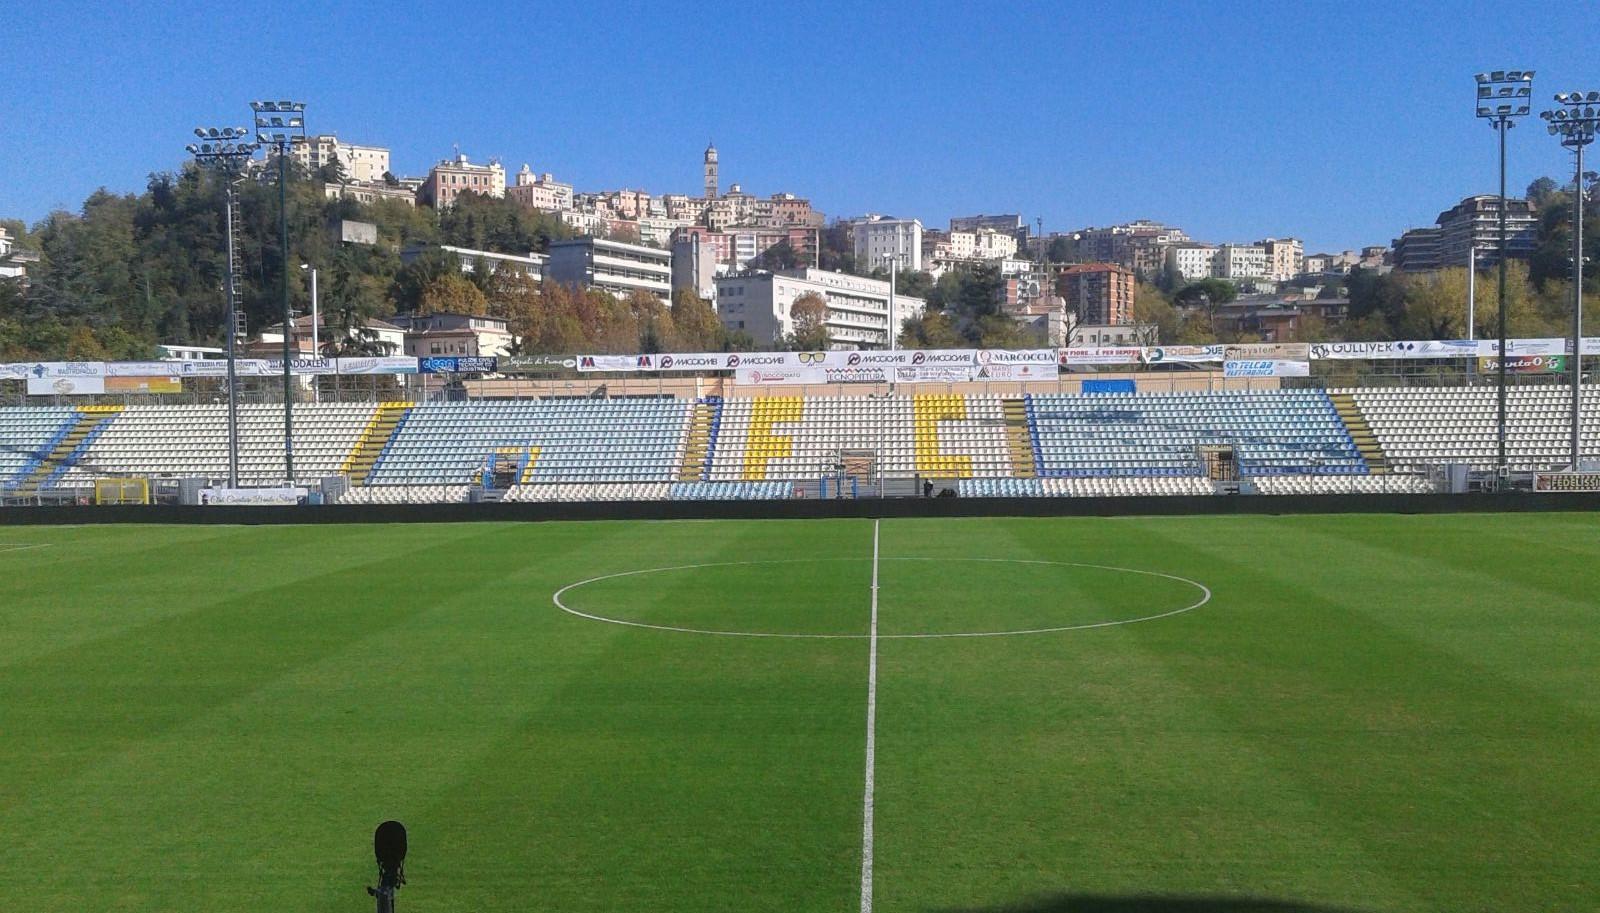 Calendario Play Off Serie B.Programma Playoff Serie B 2016 17 Calendario Spareggi